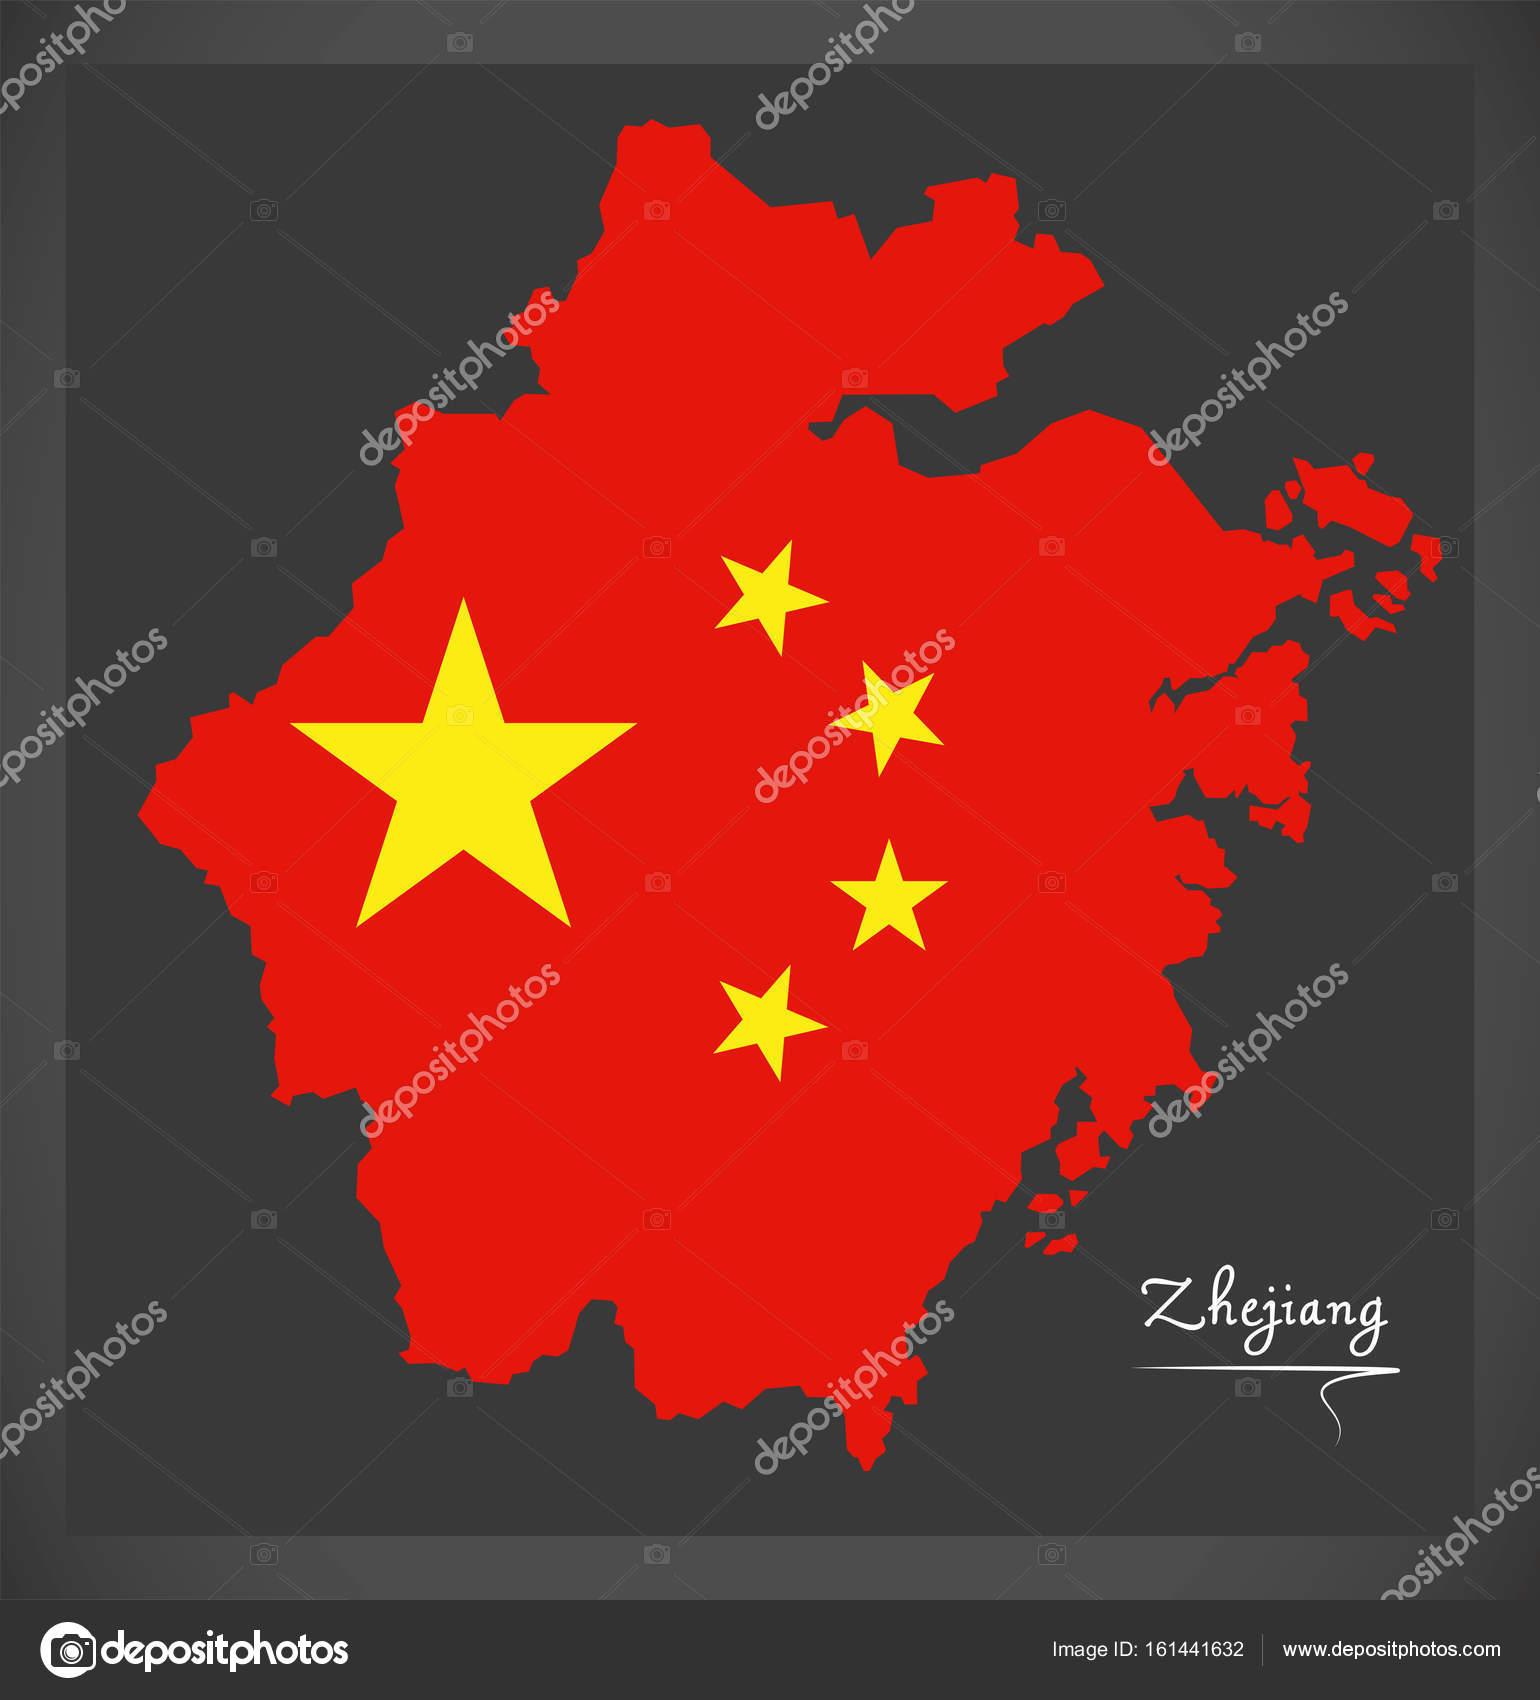 Zhejiang China Map With Chinese National Flag Illustration Stock